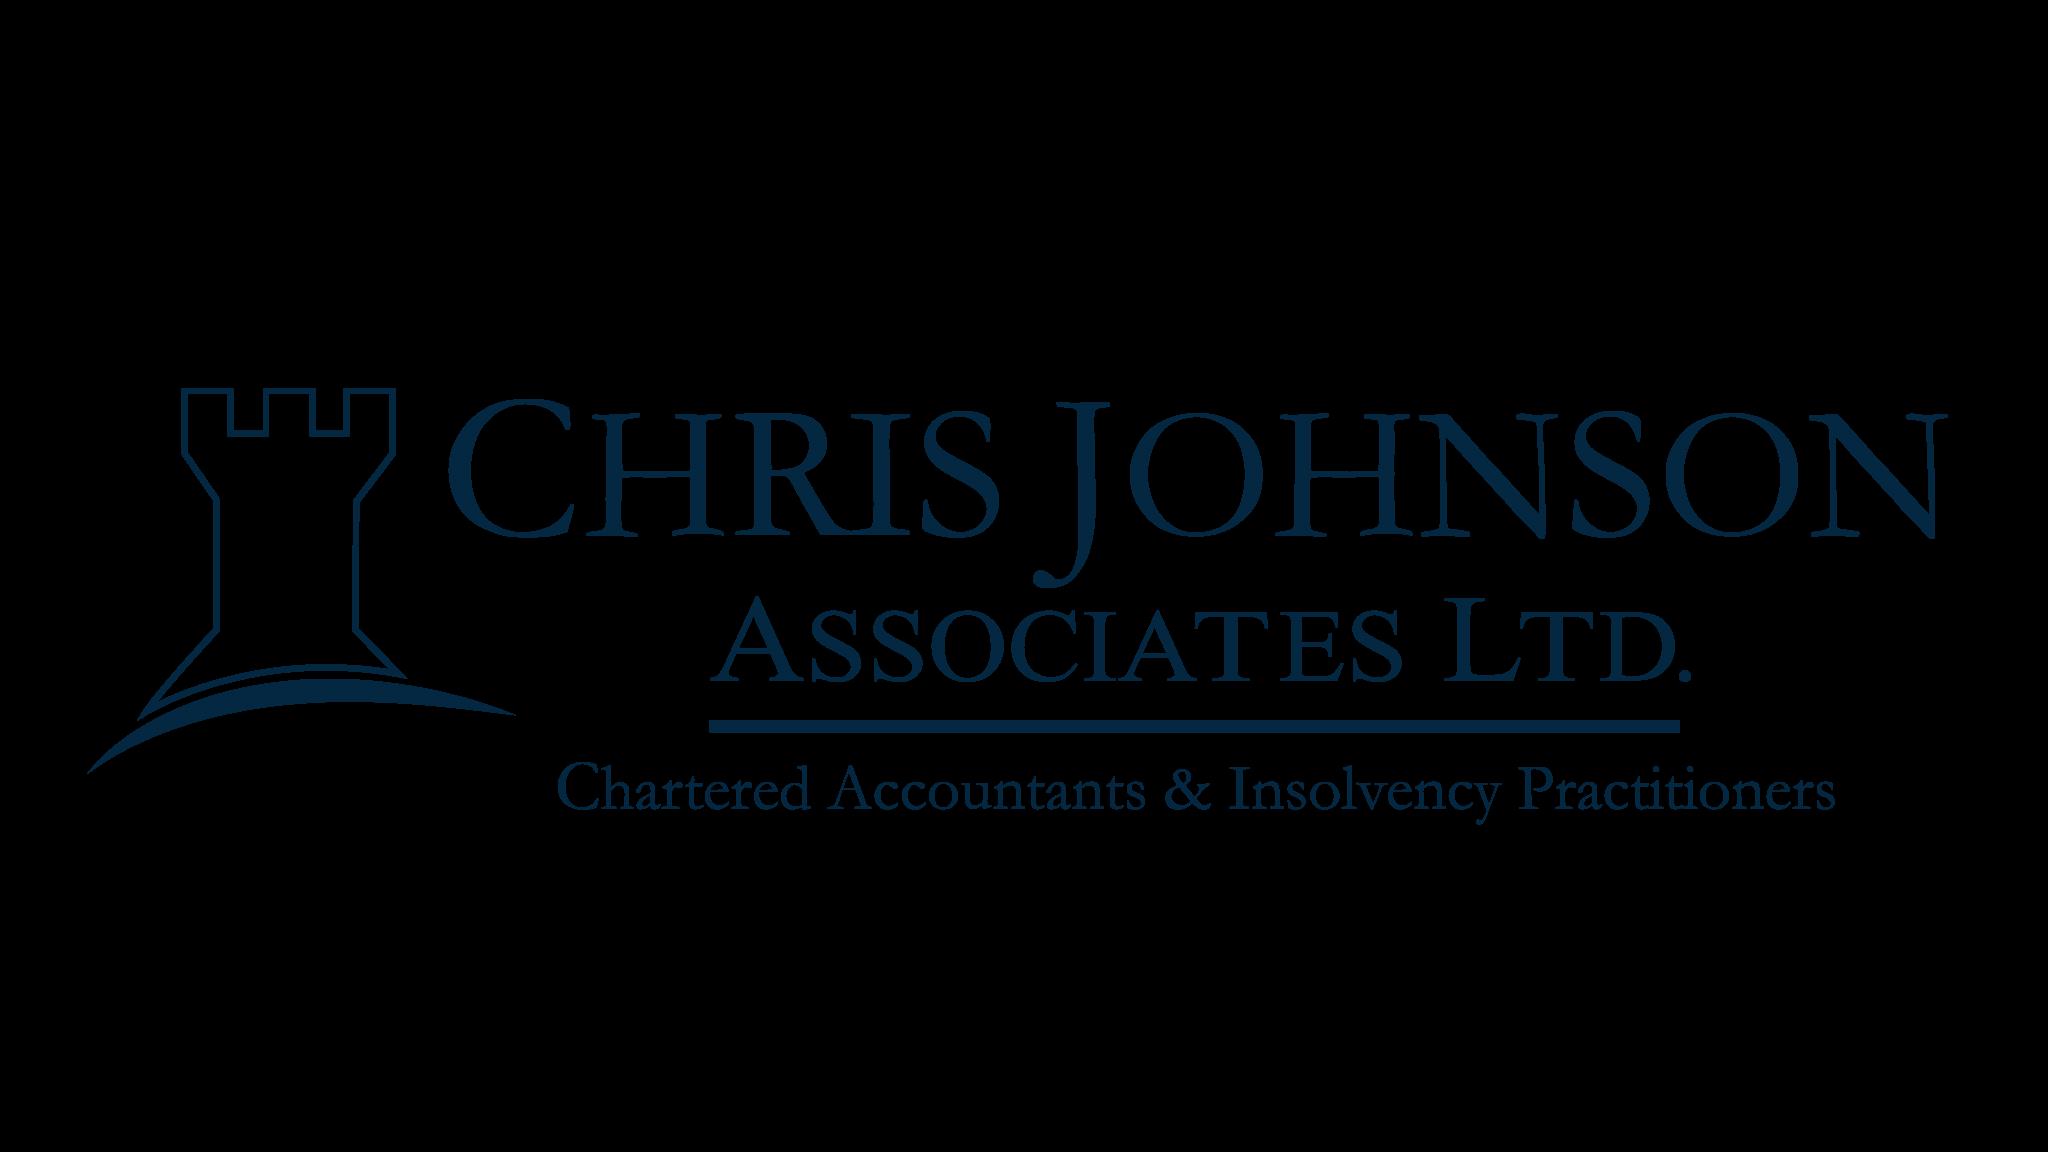 Chris Johnson Associates Ltd